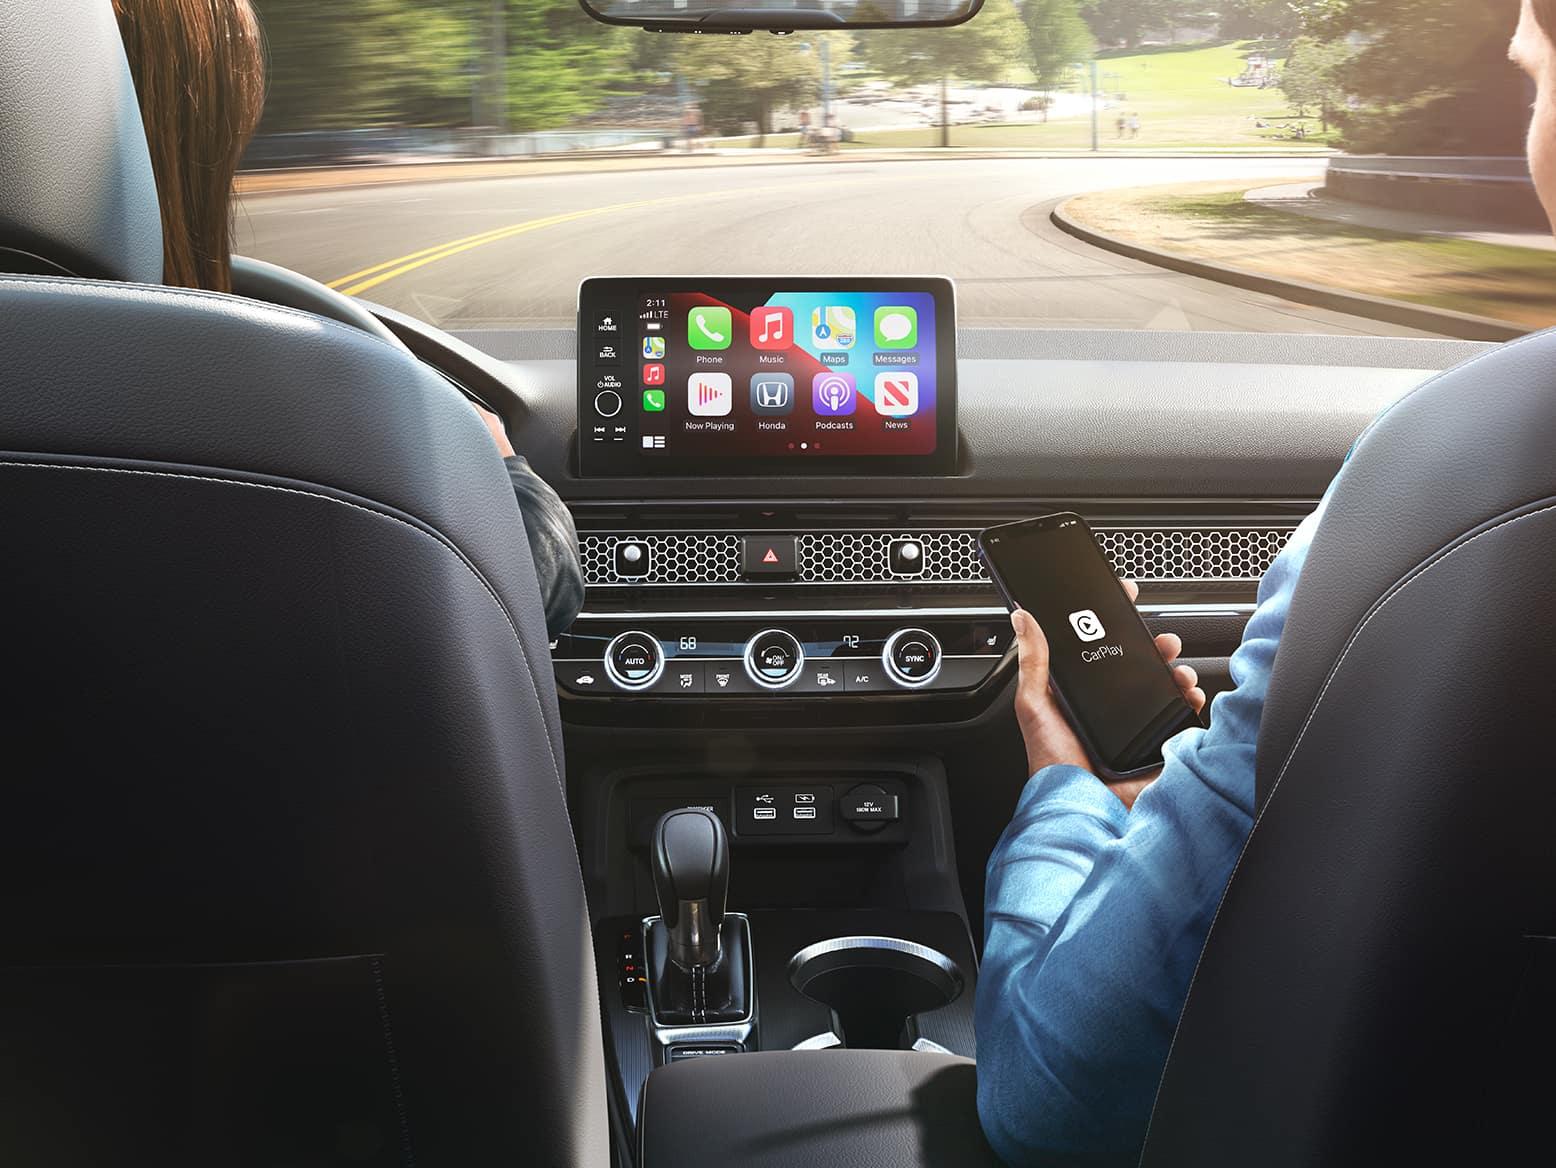 2022 Honda Civic with Wireless Apple CarPlay